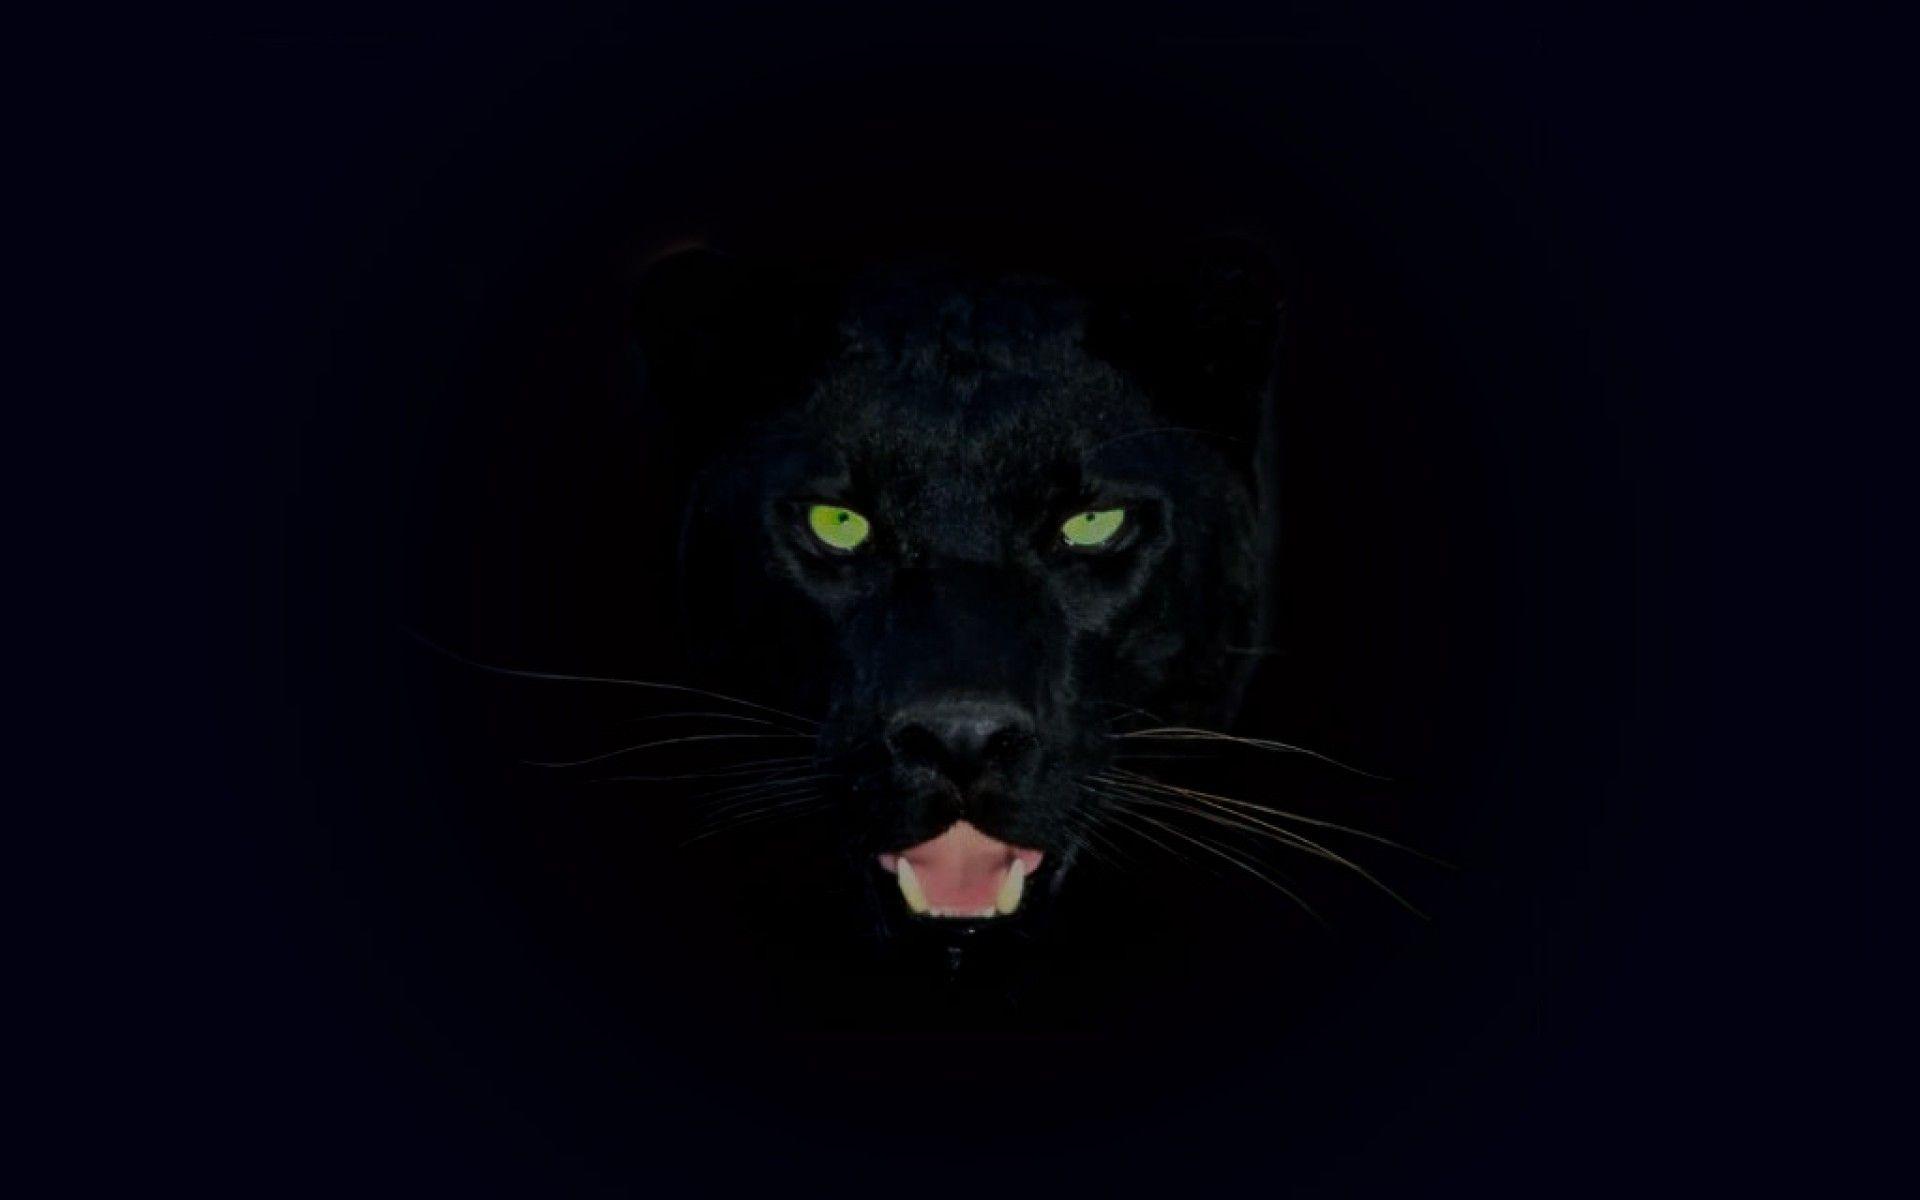 Fondos 4k Hd De Panteras Negras: Black Jaguar Wallpapers (45 Wallpapers)